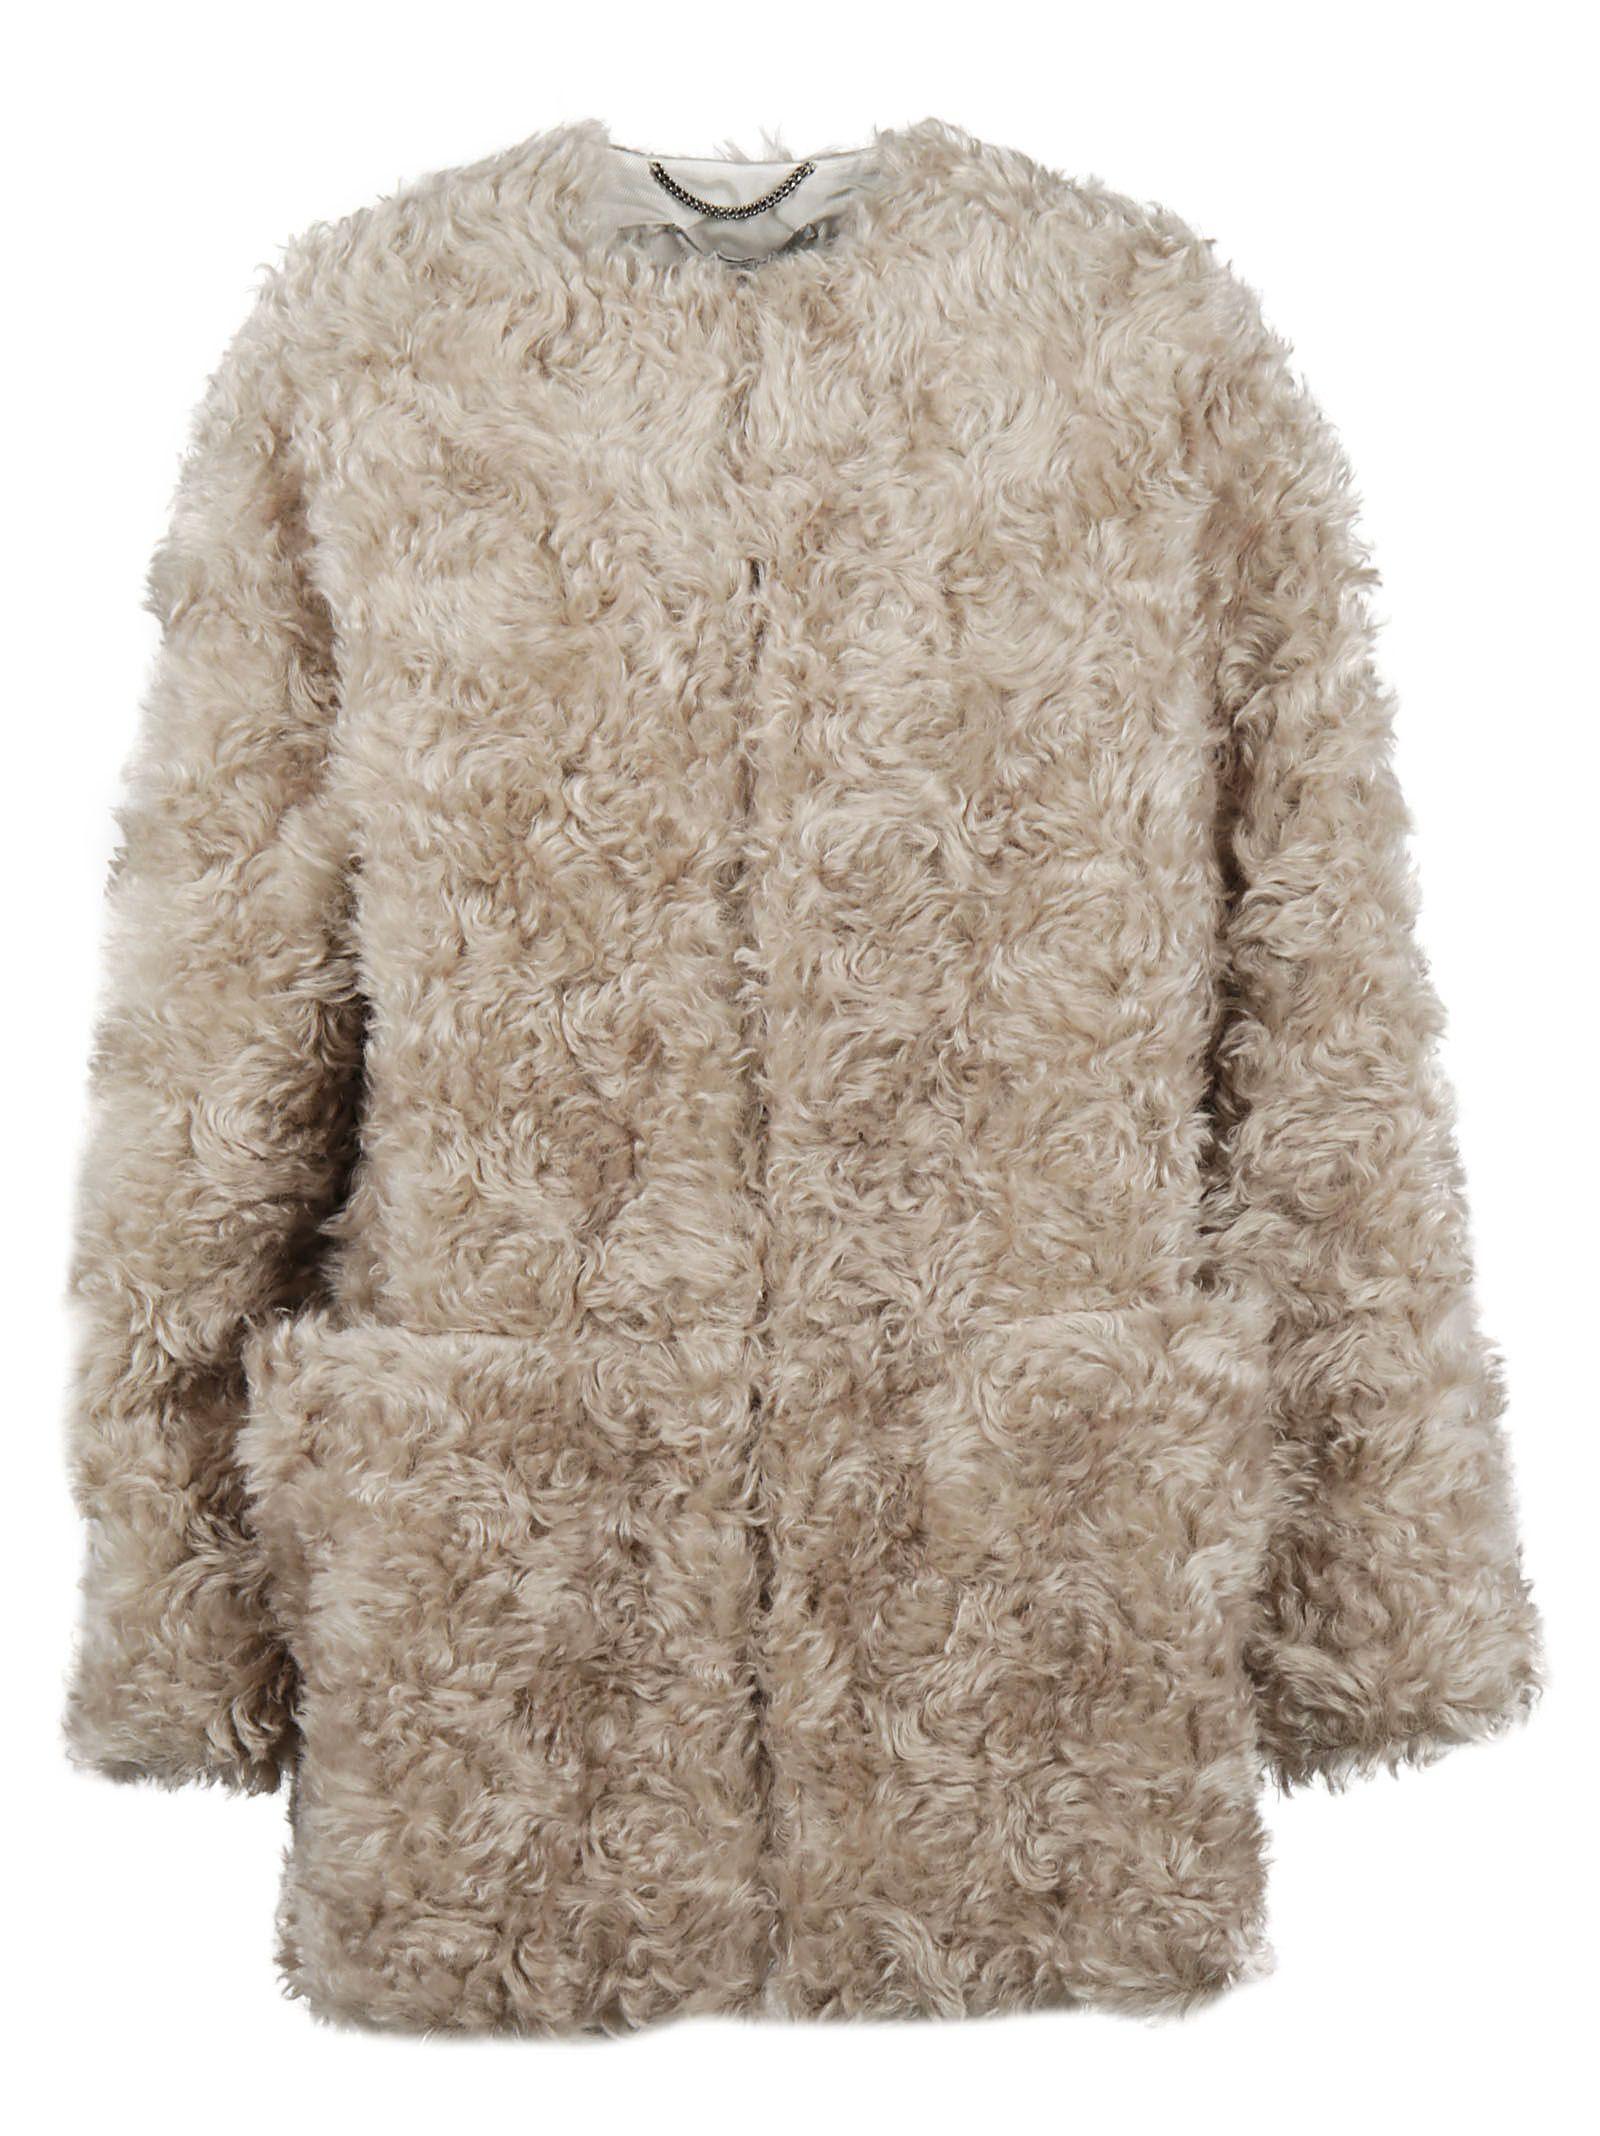 Stella Mccartney Fur Coat In Beige